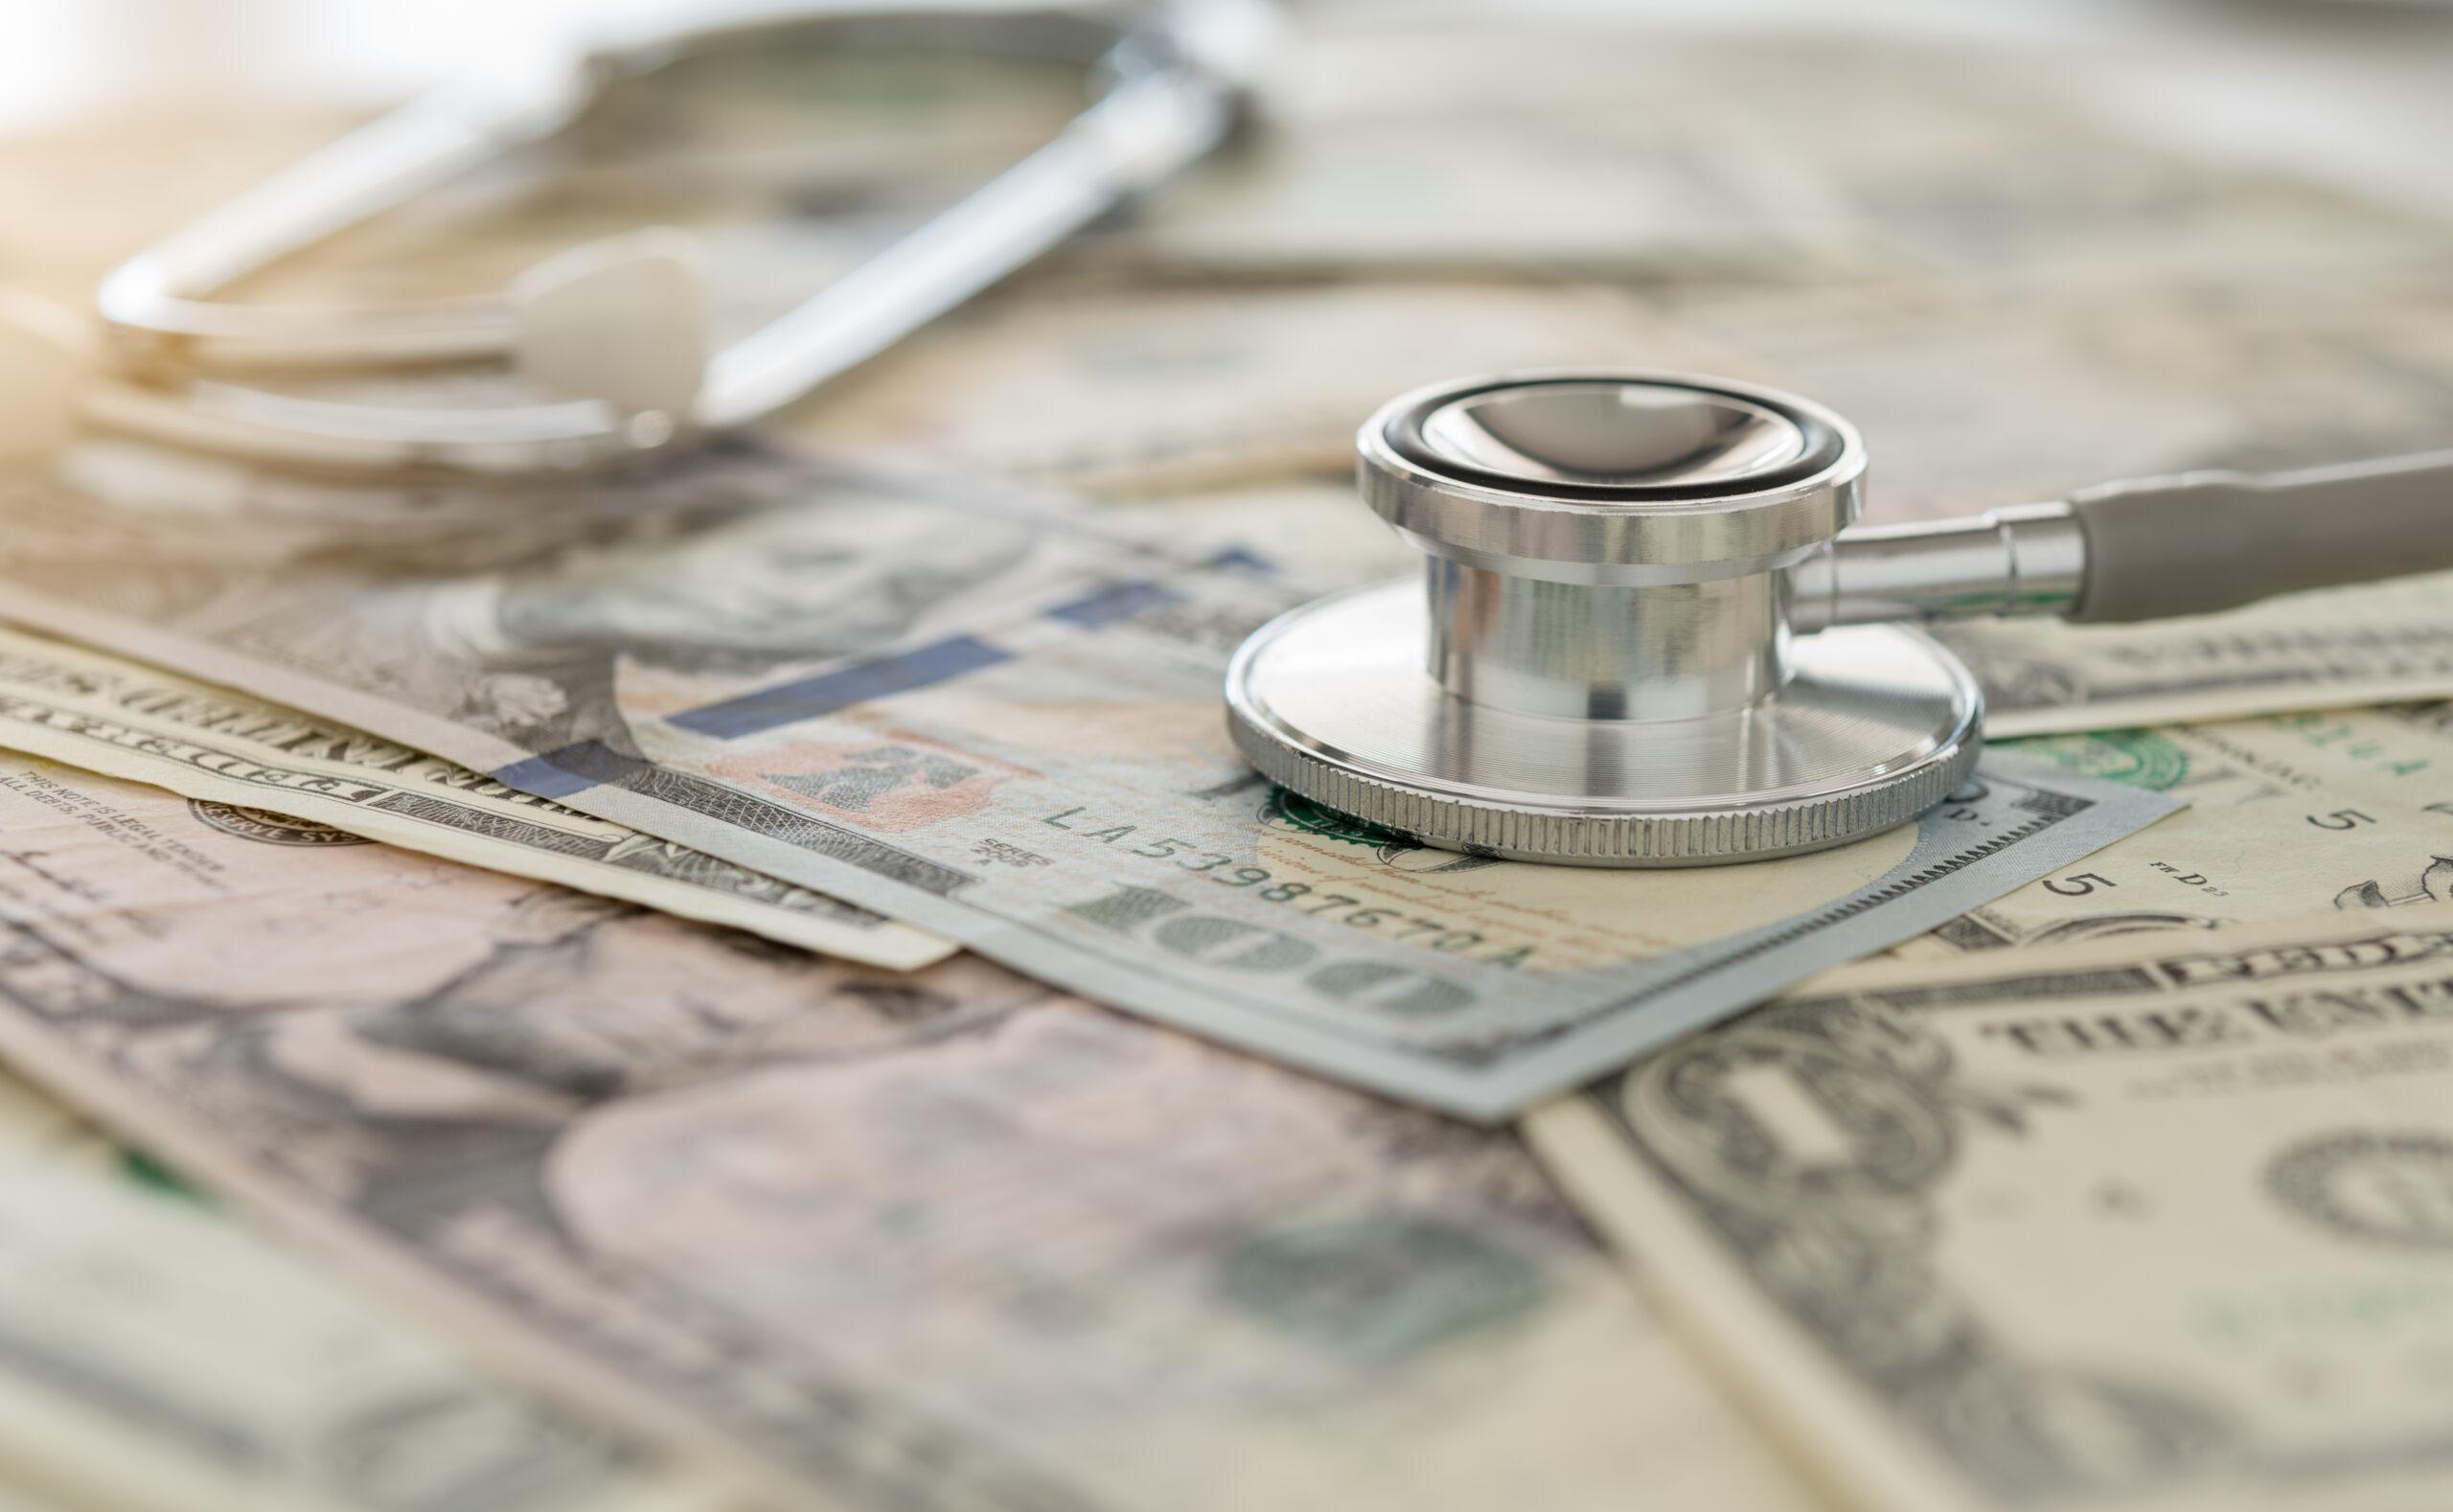 HRSA Announced $25.5 Billion in Funding